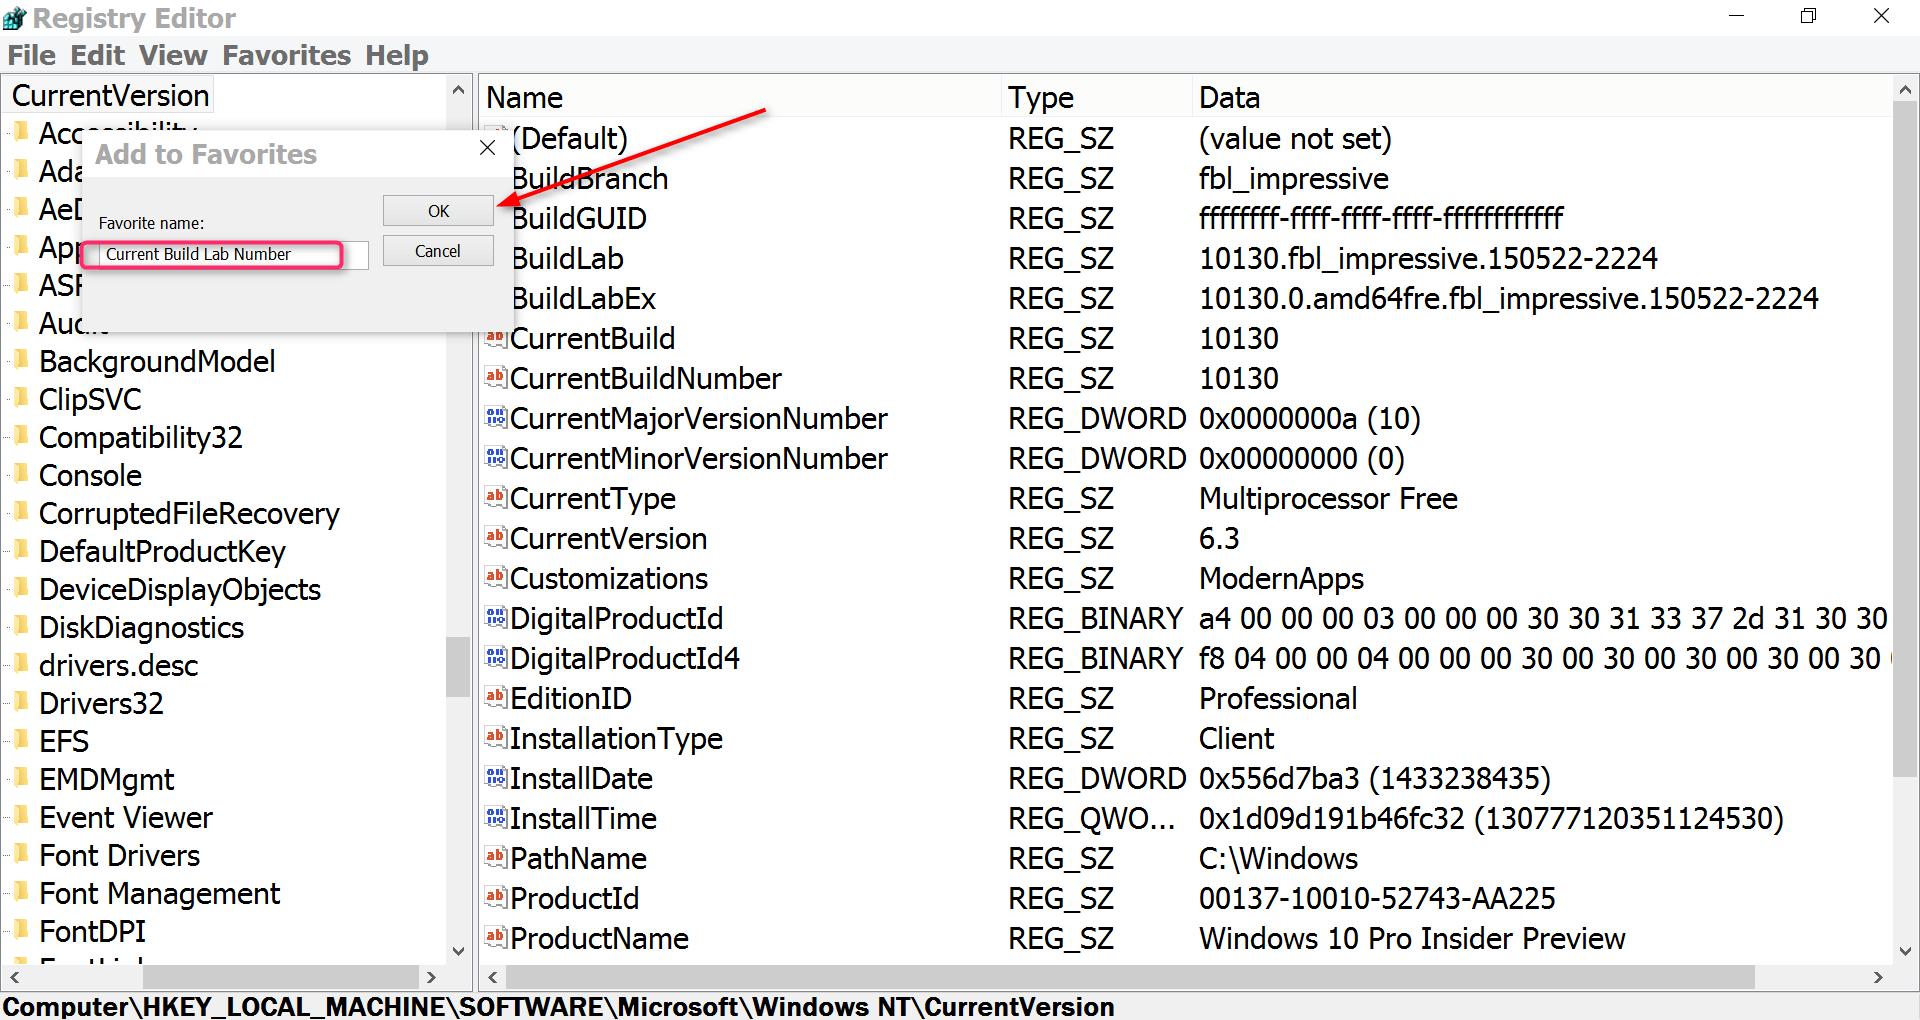 https://www.tenforums.com/attachments/tutorials/21319d1434036241-add-remove-registry-favorites-windows-2015-06-11_11h20_48.png